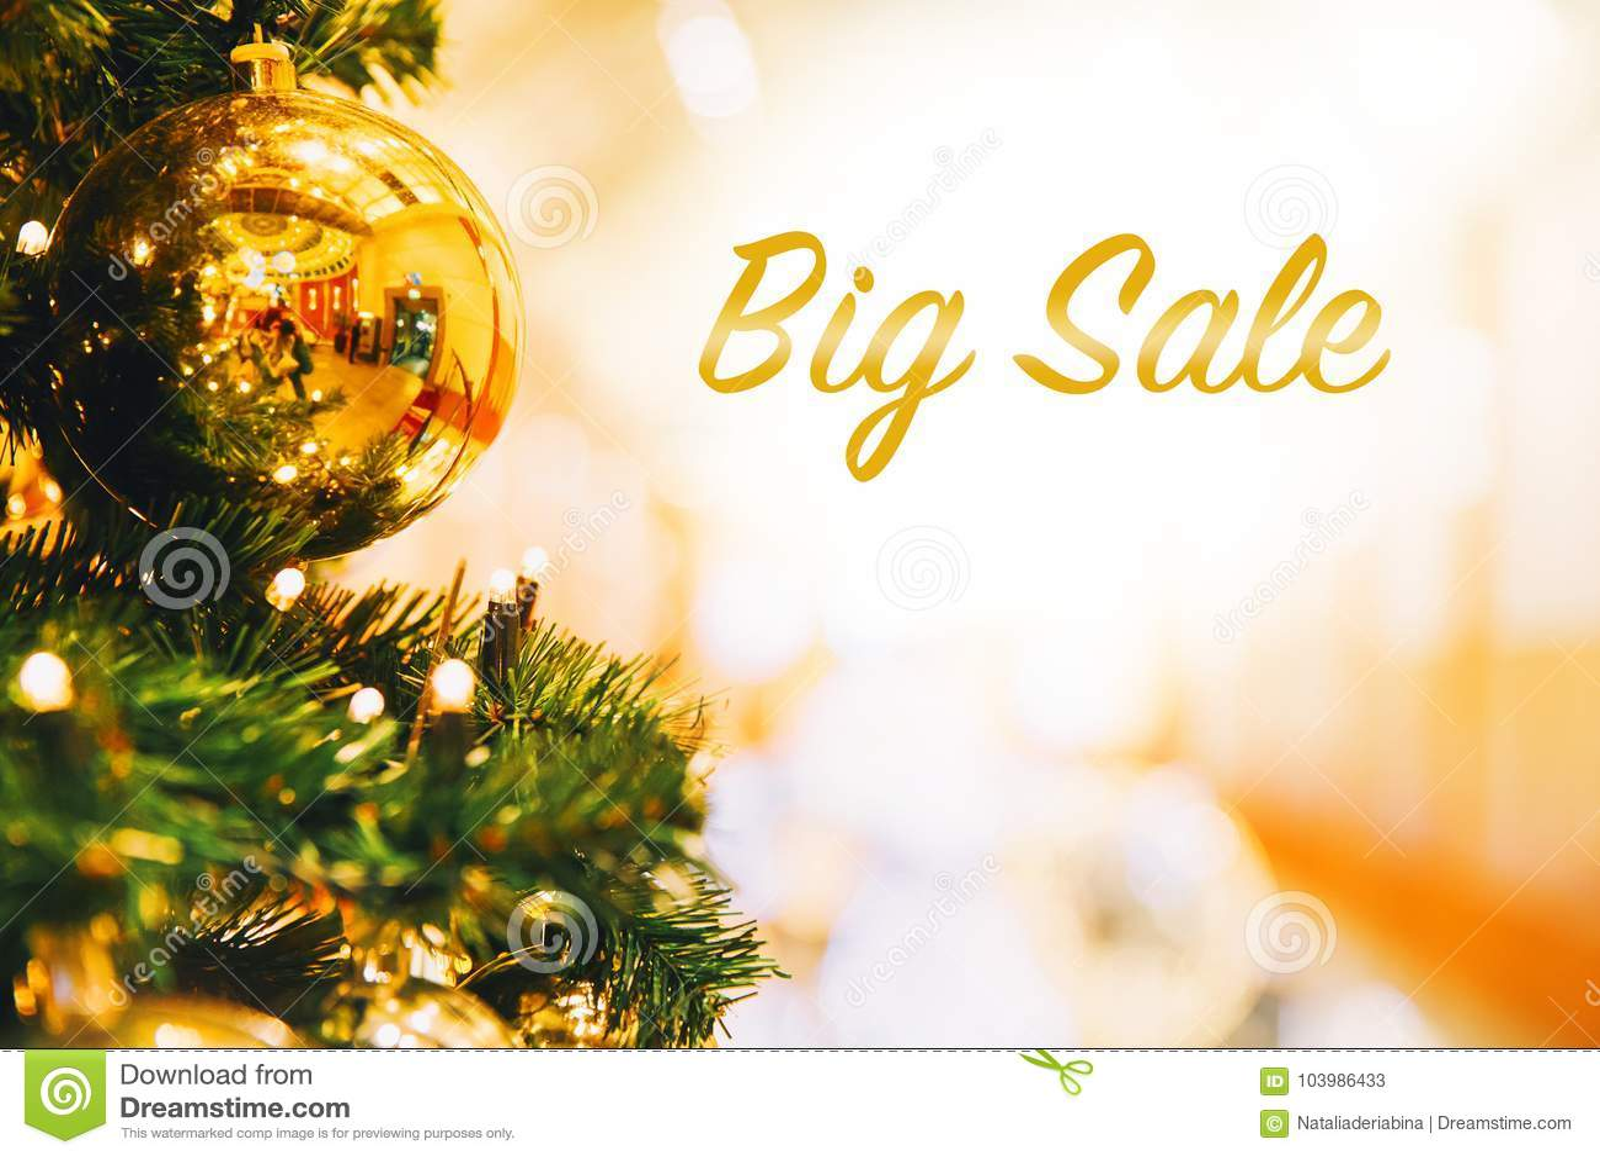 Big Sale. Christmas Gold Balls Stock Image - Image of europe, blurry ...